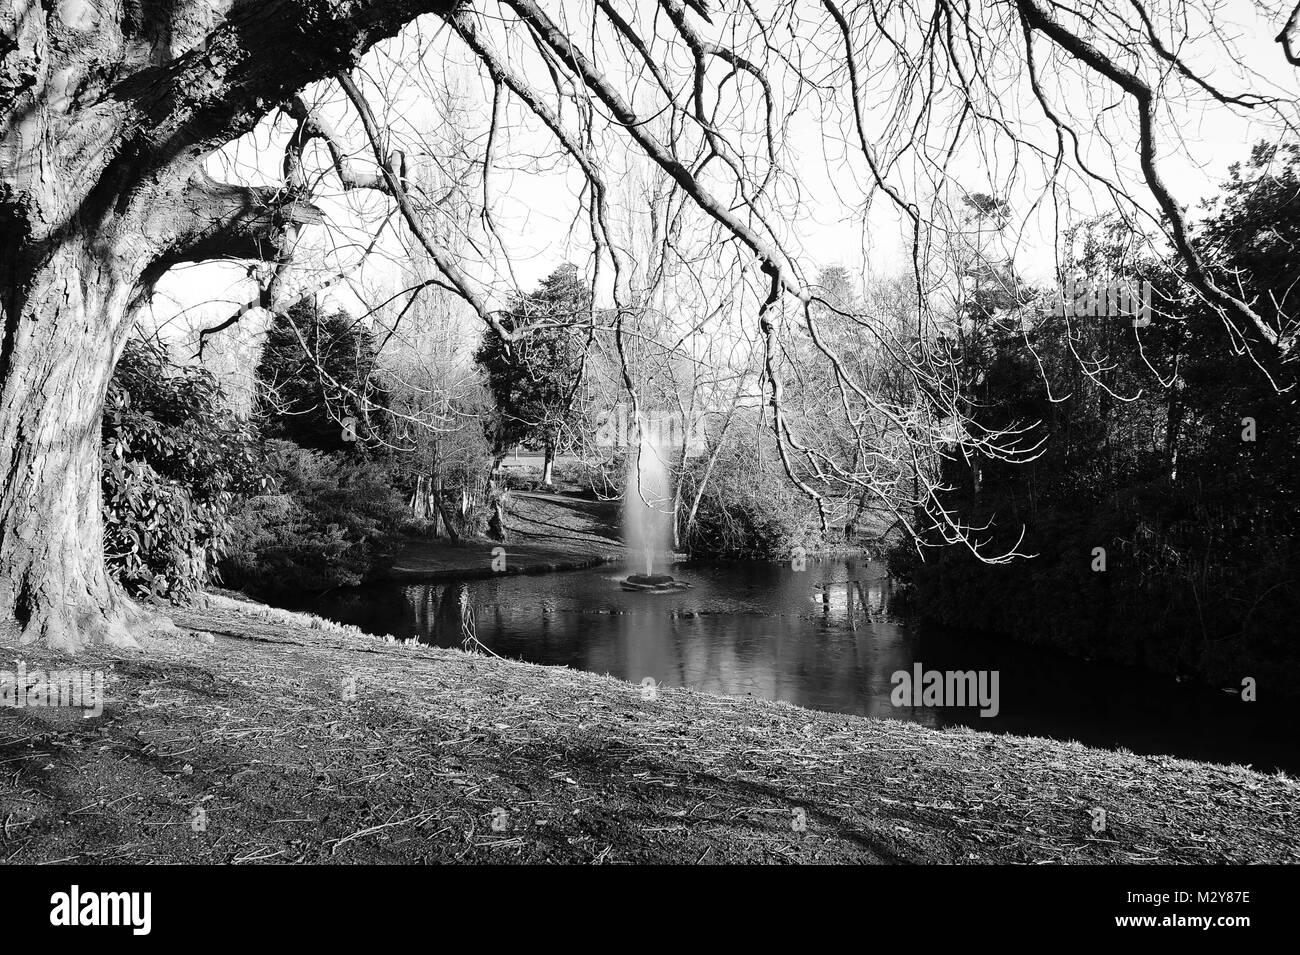 Sefton Park, Winter time - Stock Image